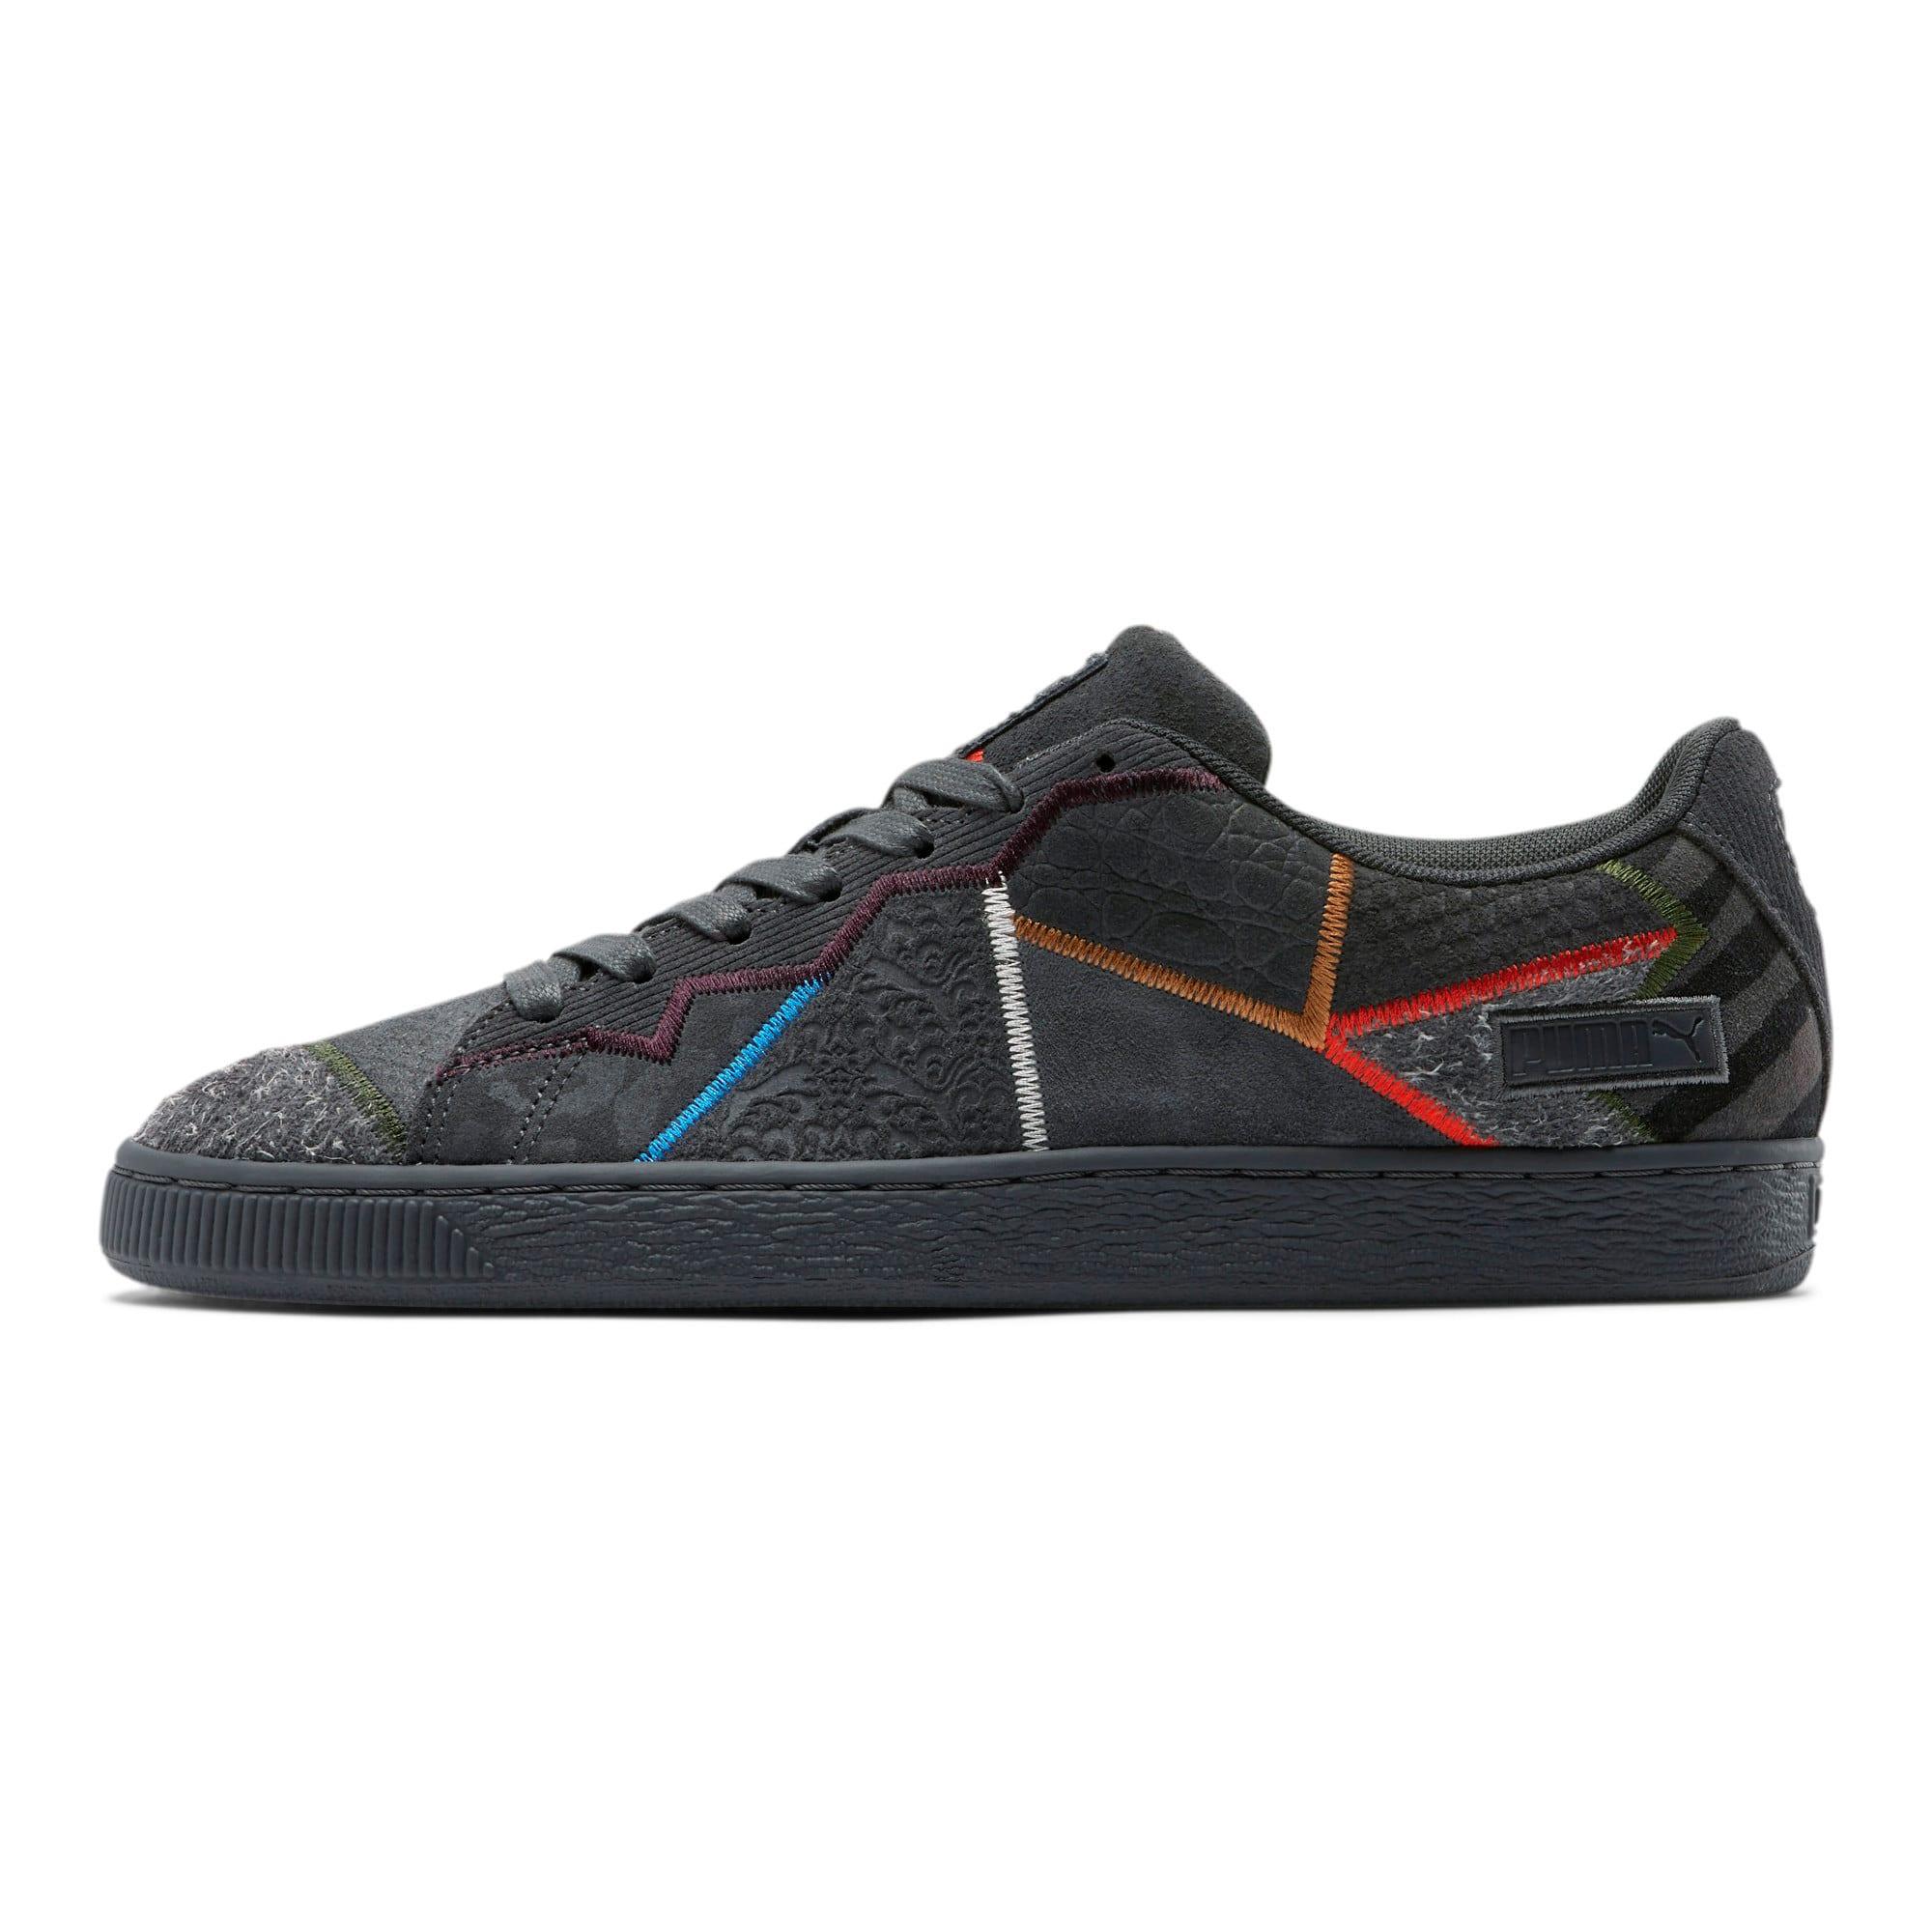 Thumbnail 1 of Suede RP Fashion Geek Sneakers, Asphalt, medium